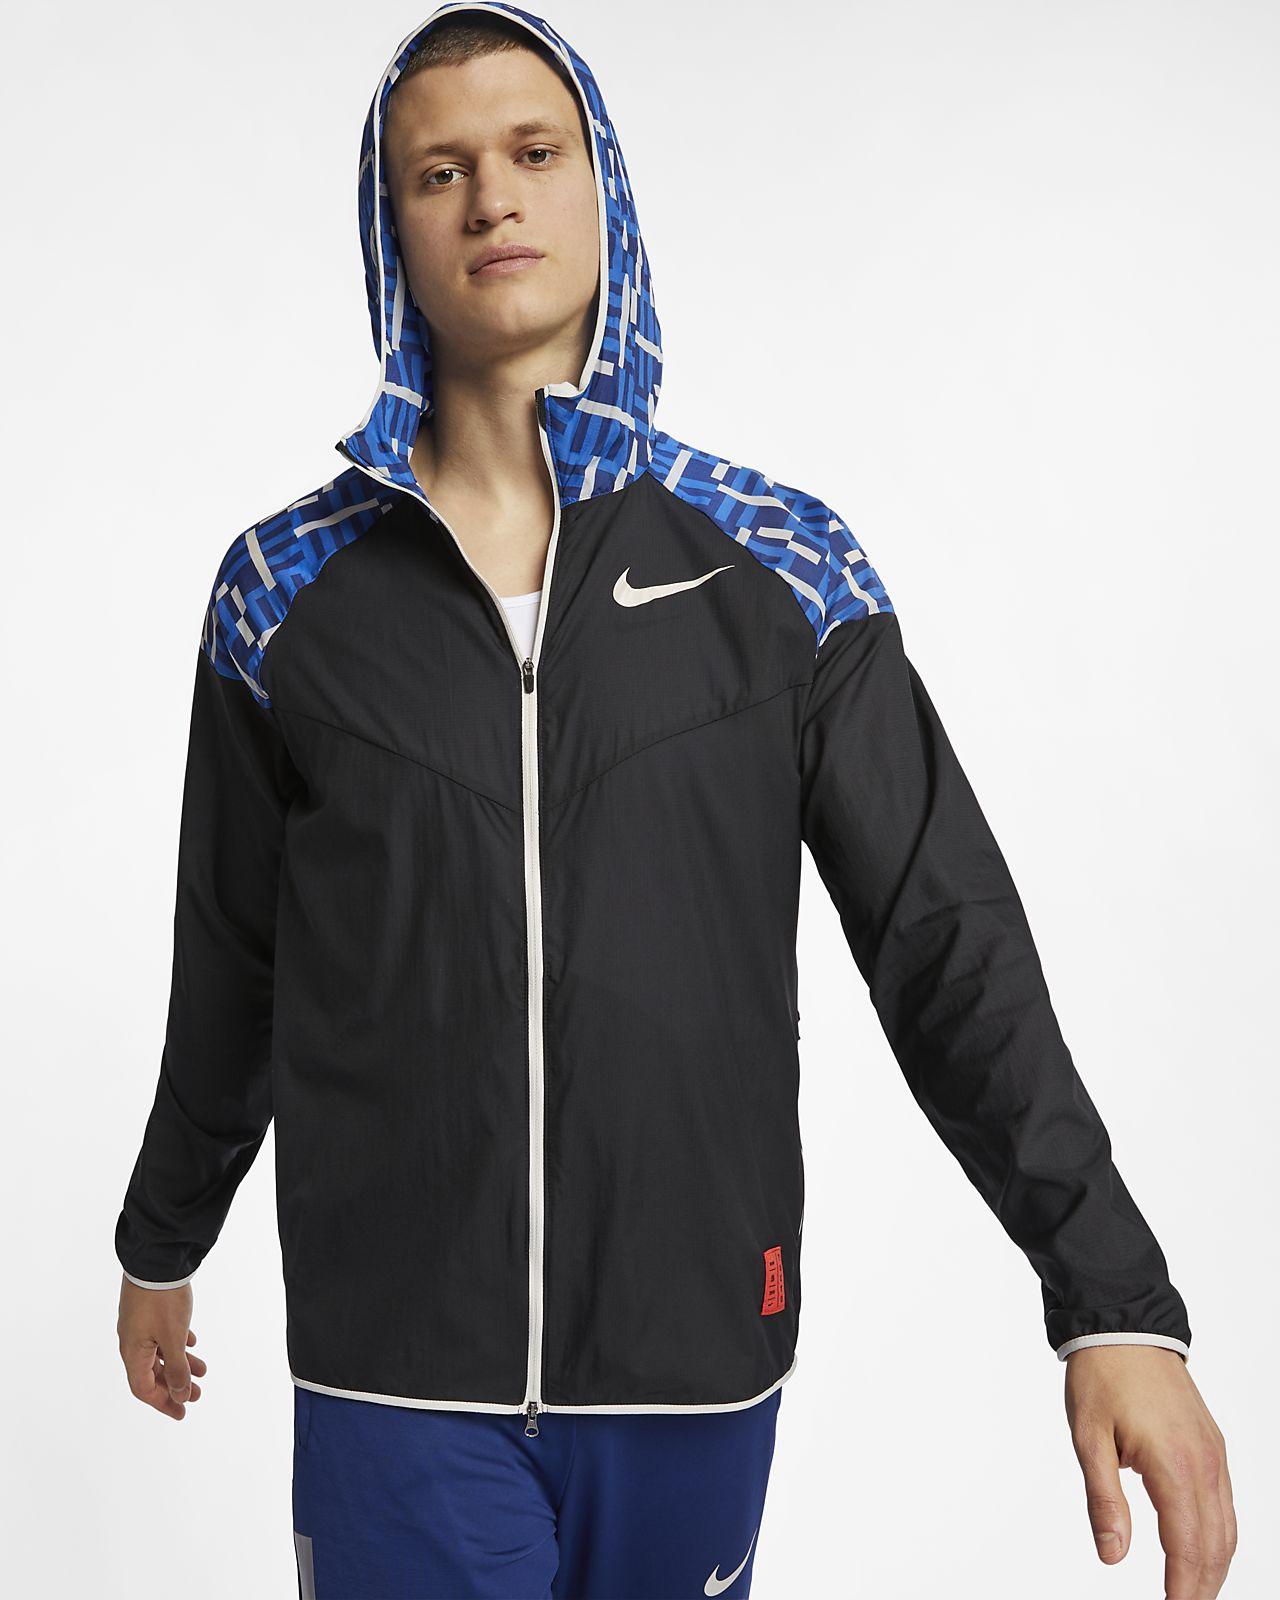 729a21d61593 Giacca da running Nike Windrunner - Uomo. Nike.com IT